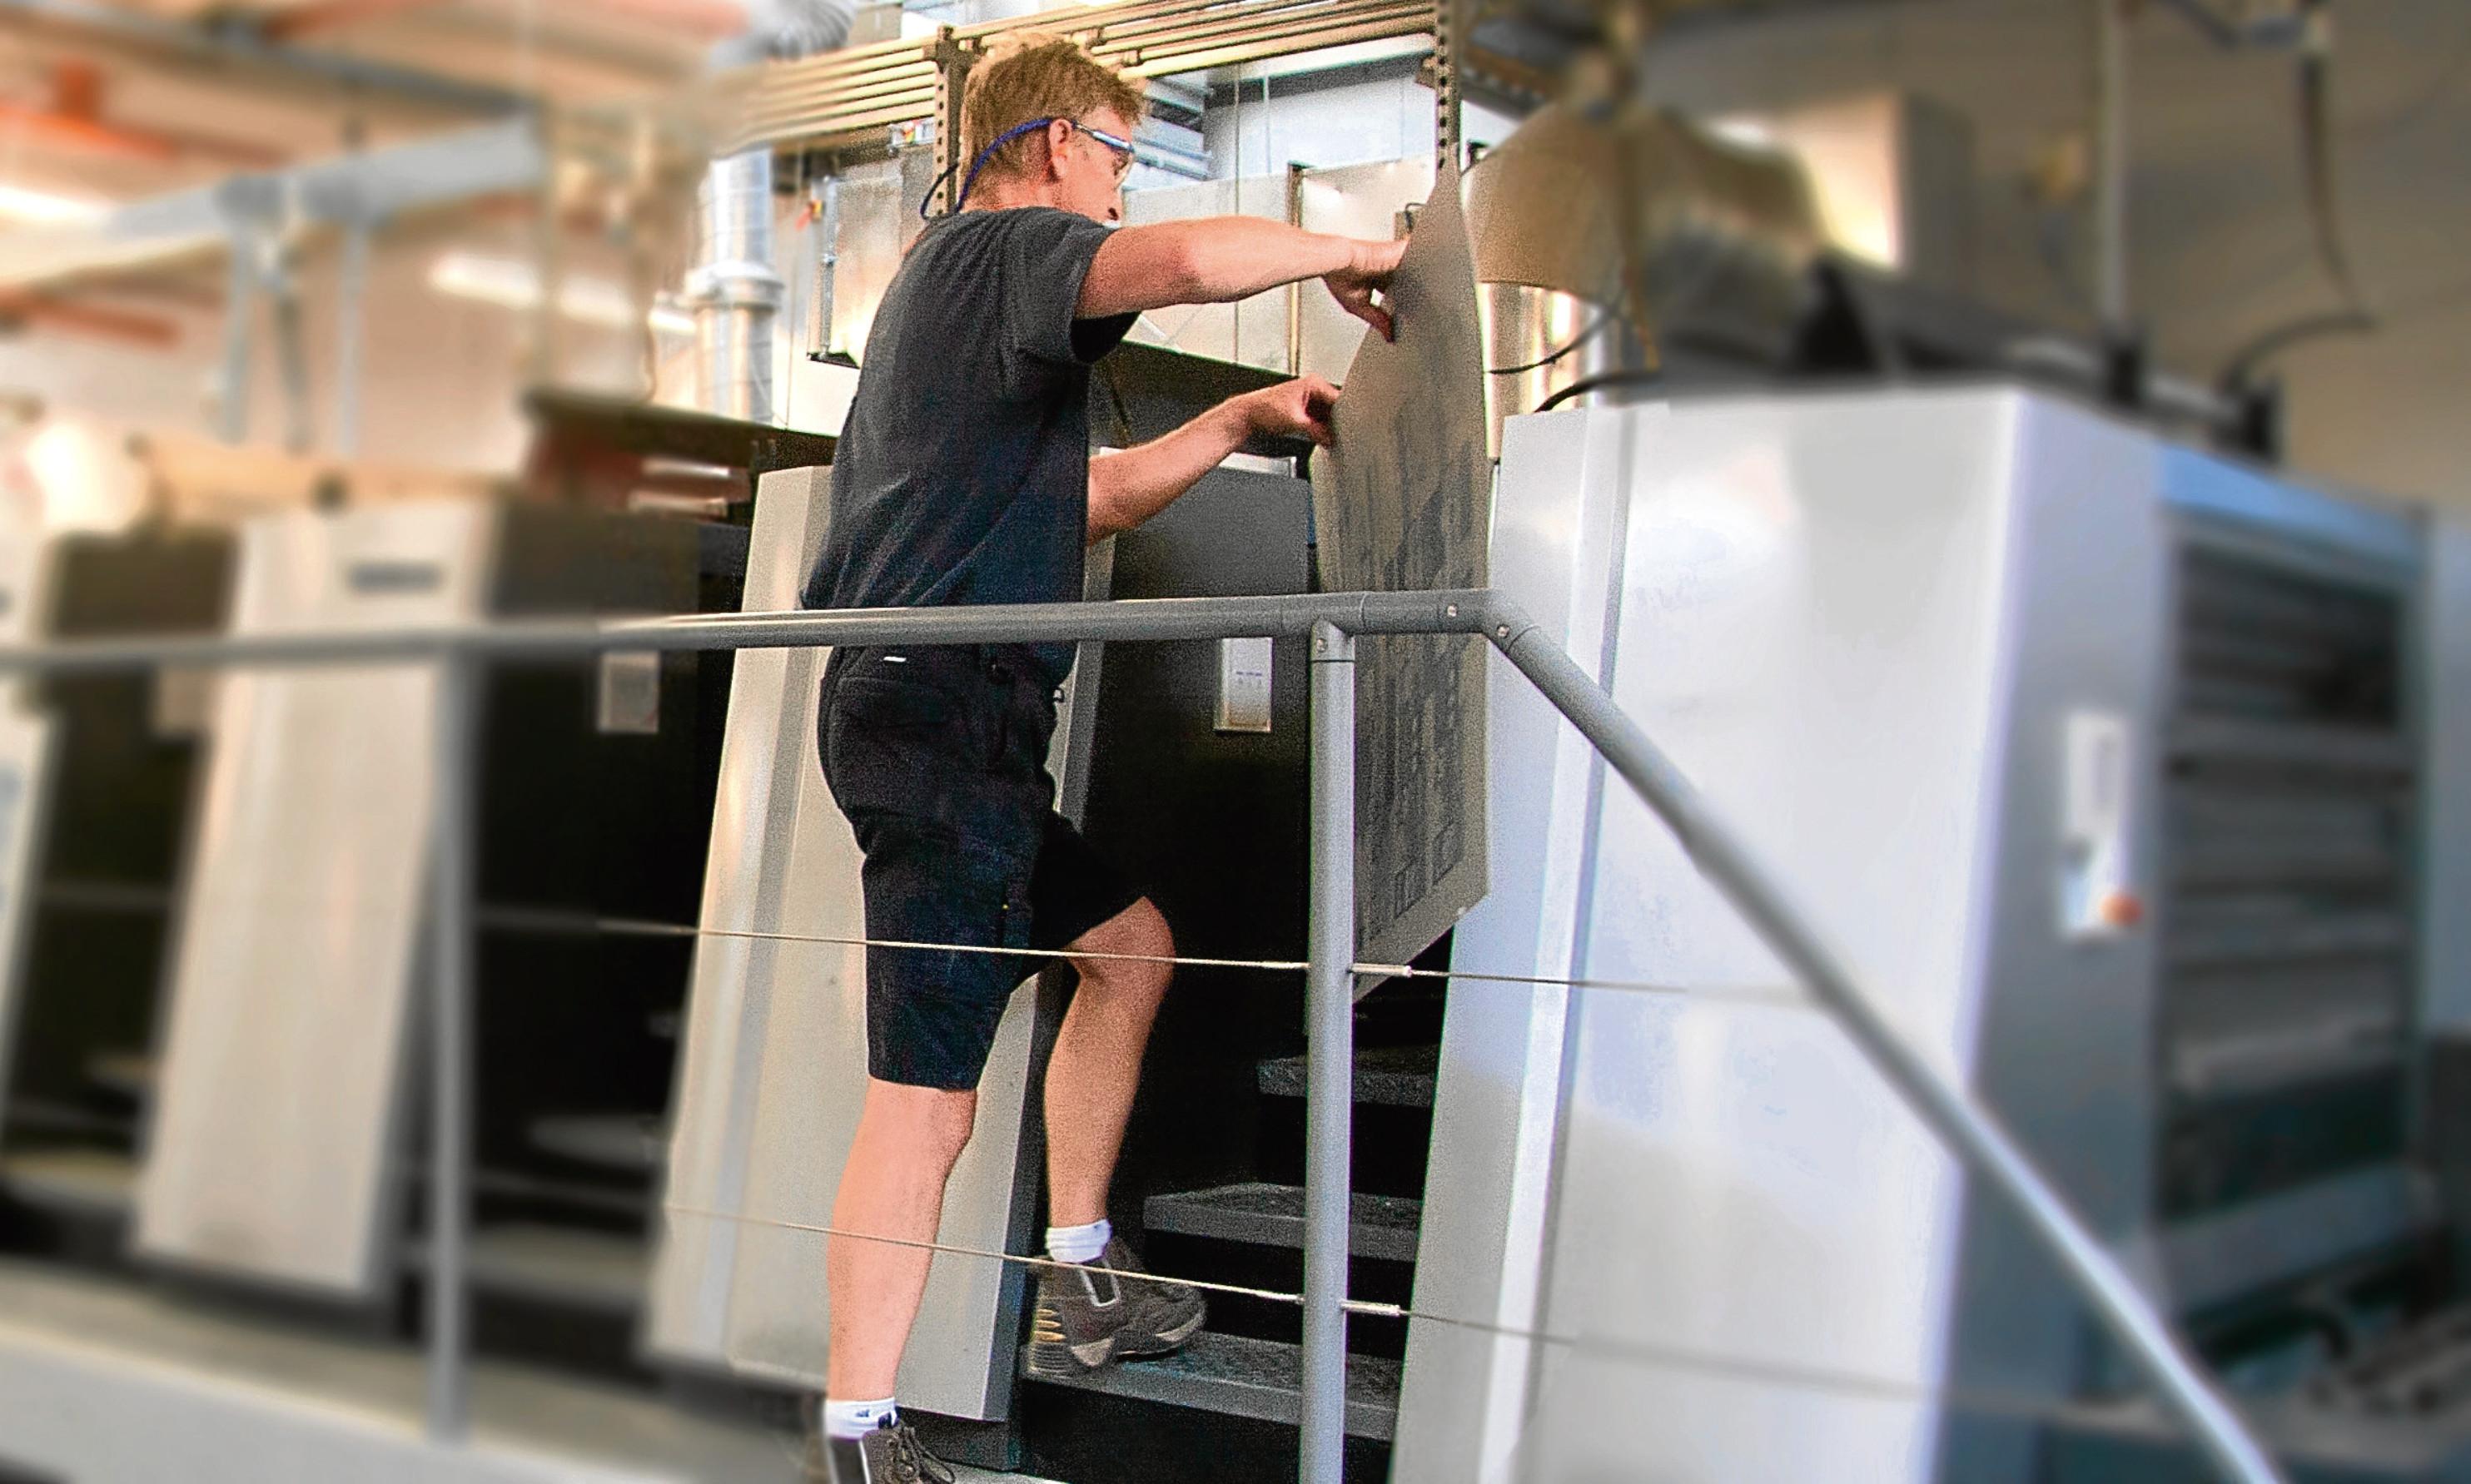 A Tradeprint technician puts a proof on a printing press